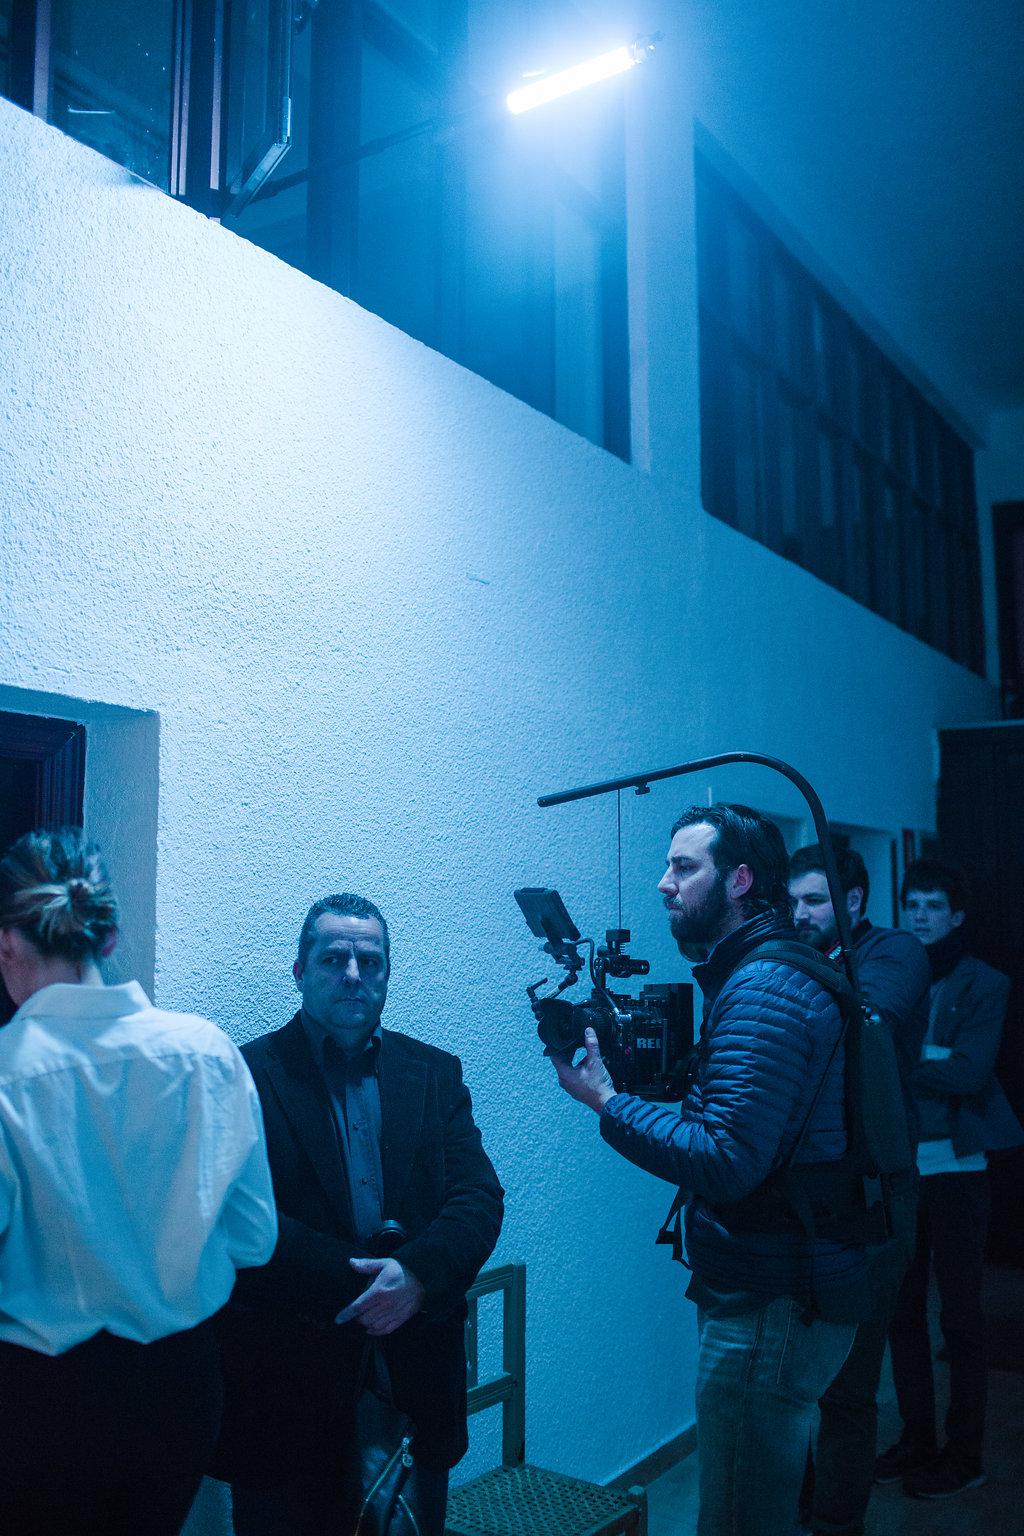 #filmmakerfriday Bittersweet Creative BTS 8